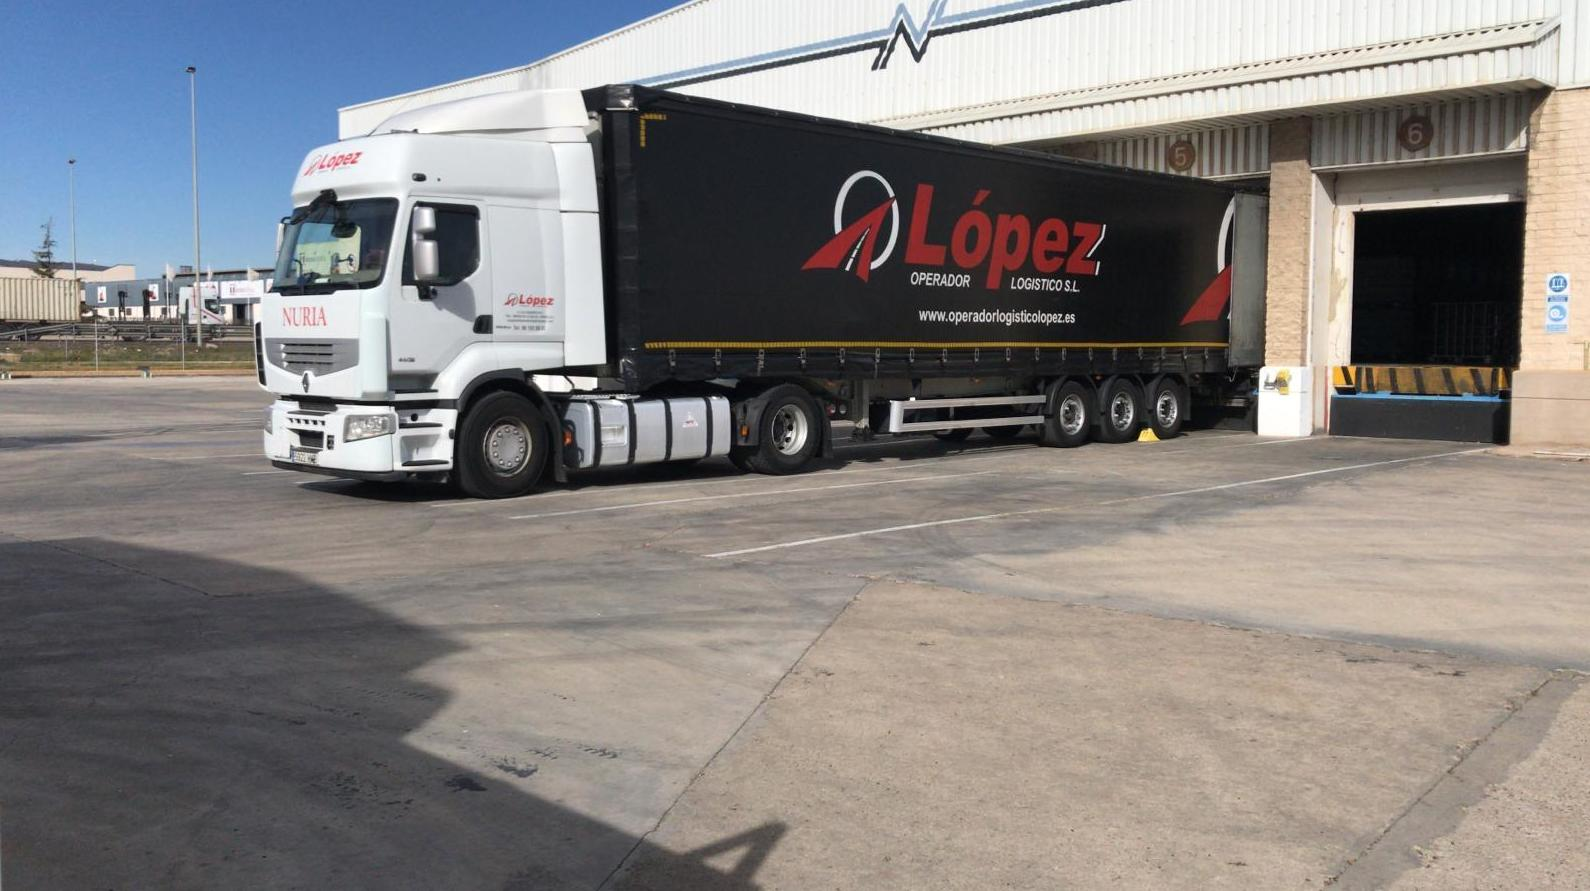 Foto 3 de Transportes de mercancía por grupaje o cargas completas en 46950 Xirivella | Transportes López